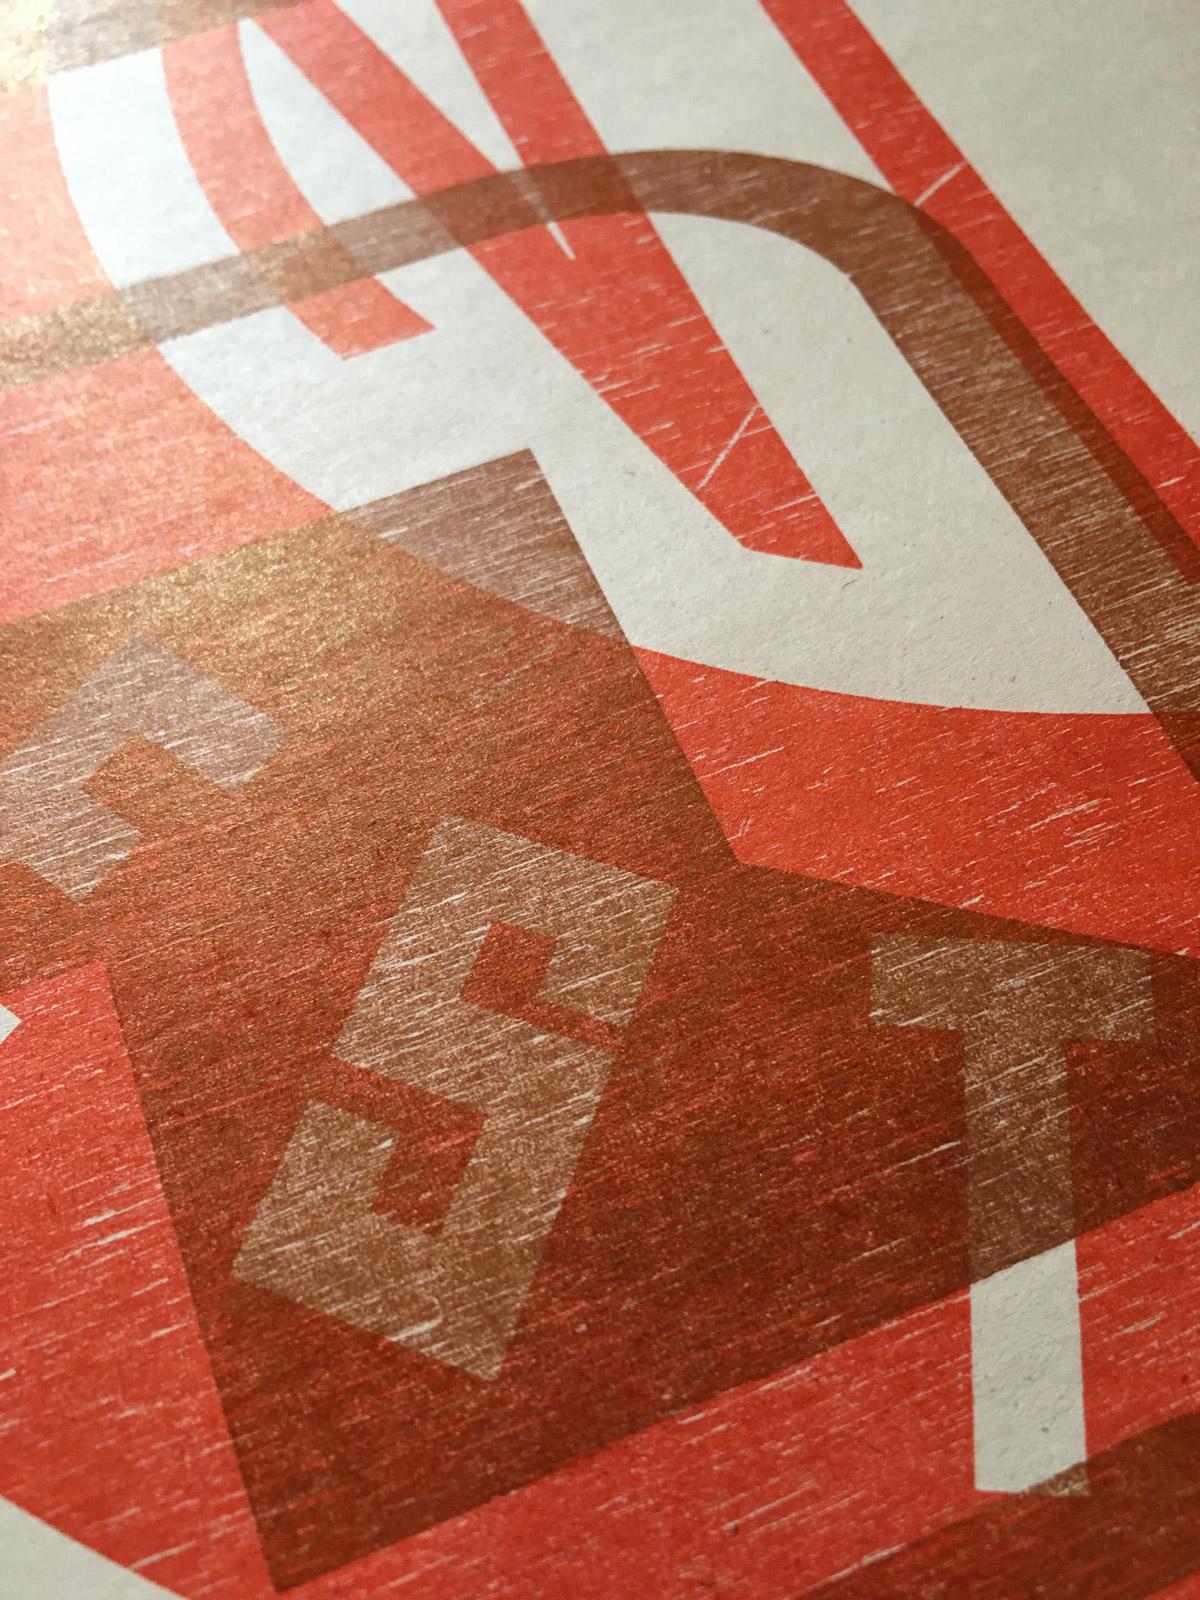 WrappingPaper-06.jpg